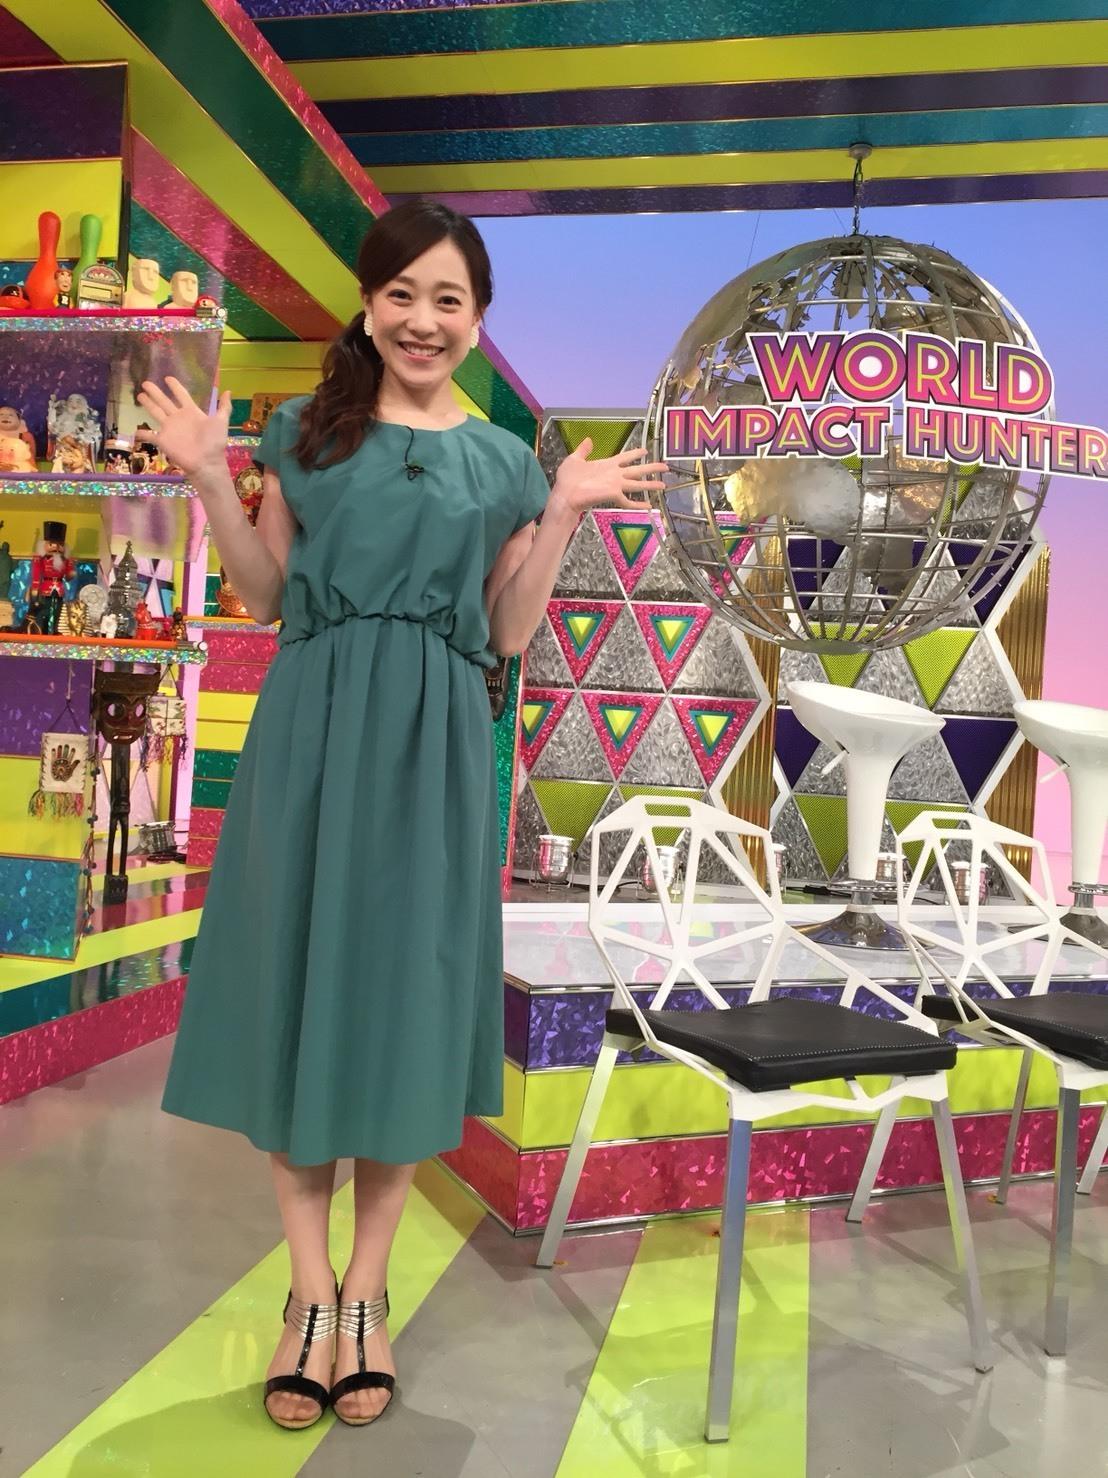 【TBS:ひるおび!】江藤愛 Part53【日曜サンデー】->画像>289枚